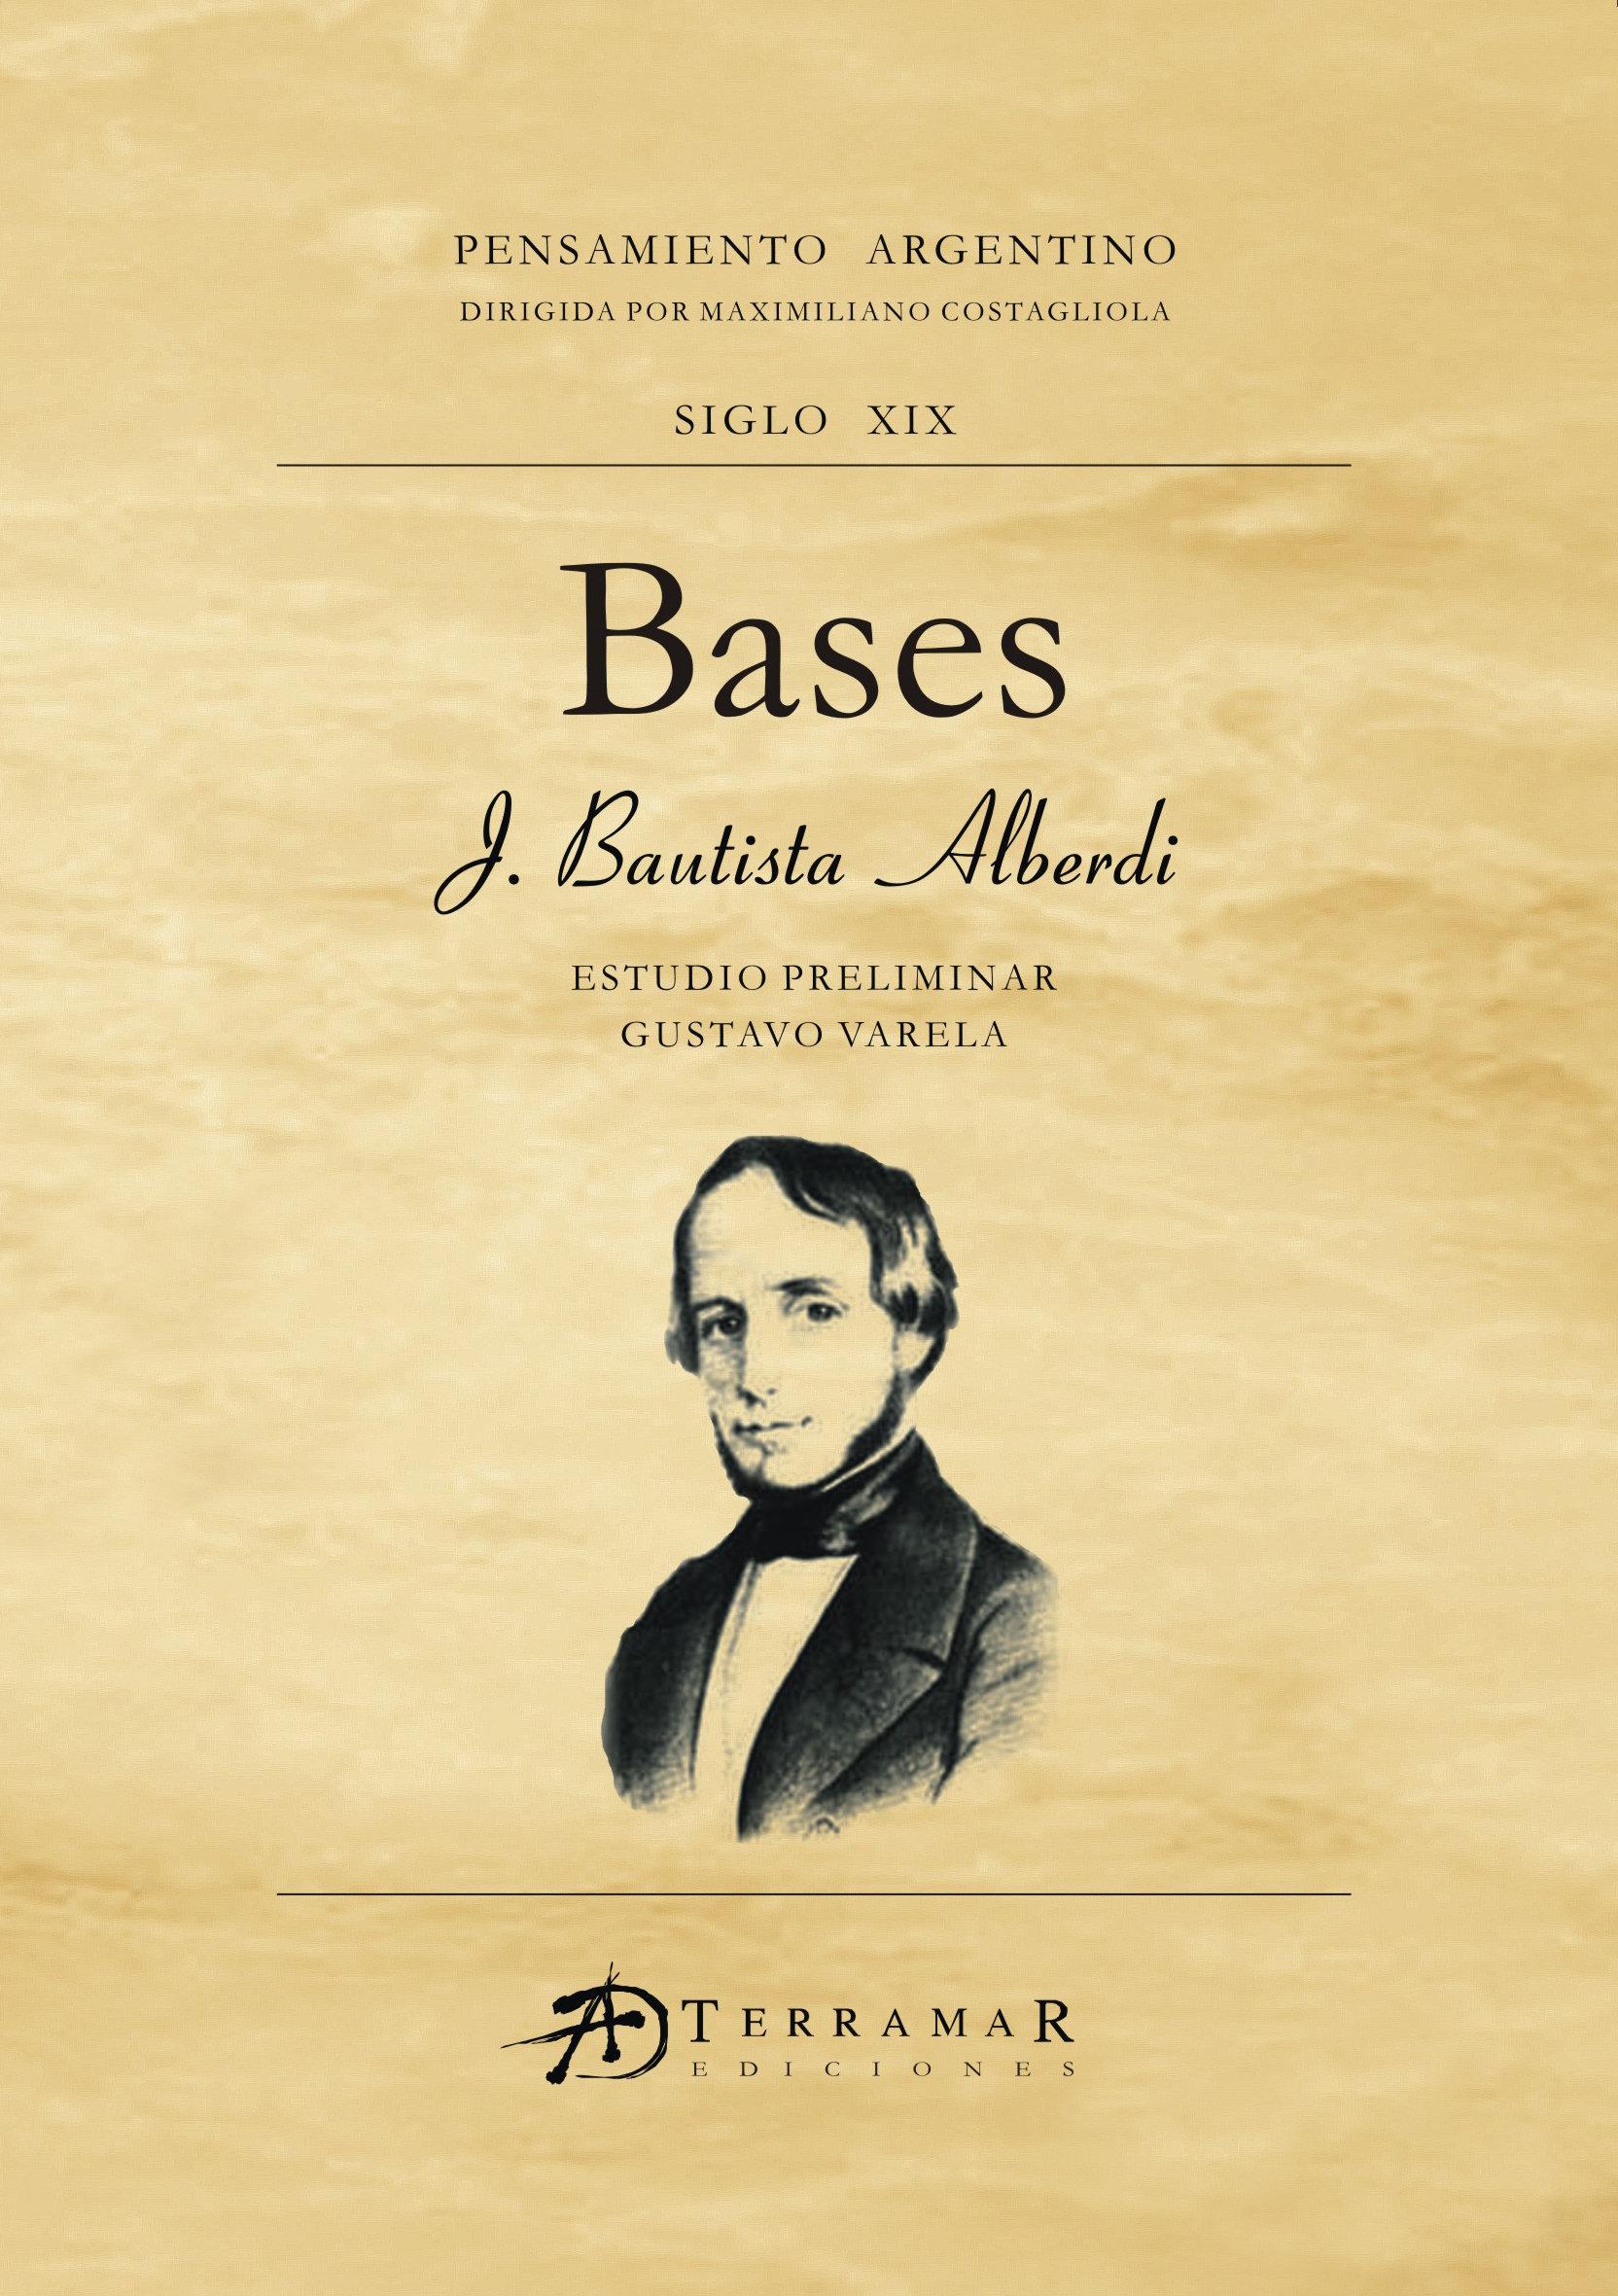 Bases - Juan Bautista Alberdi | editorial-terramar